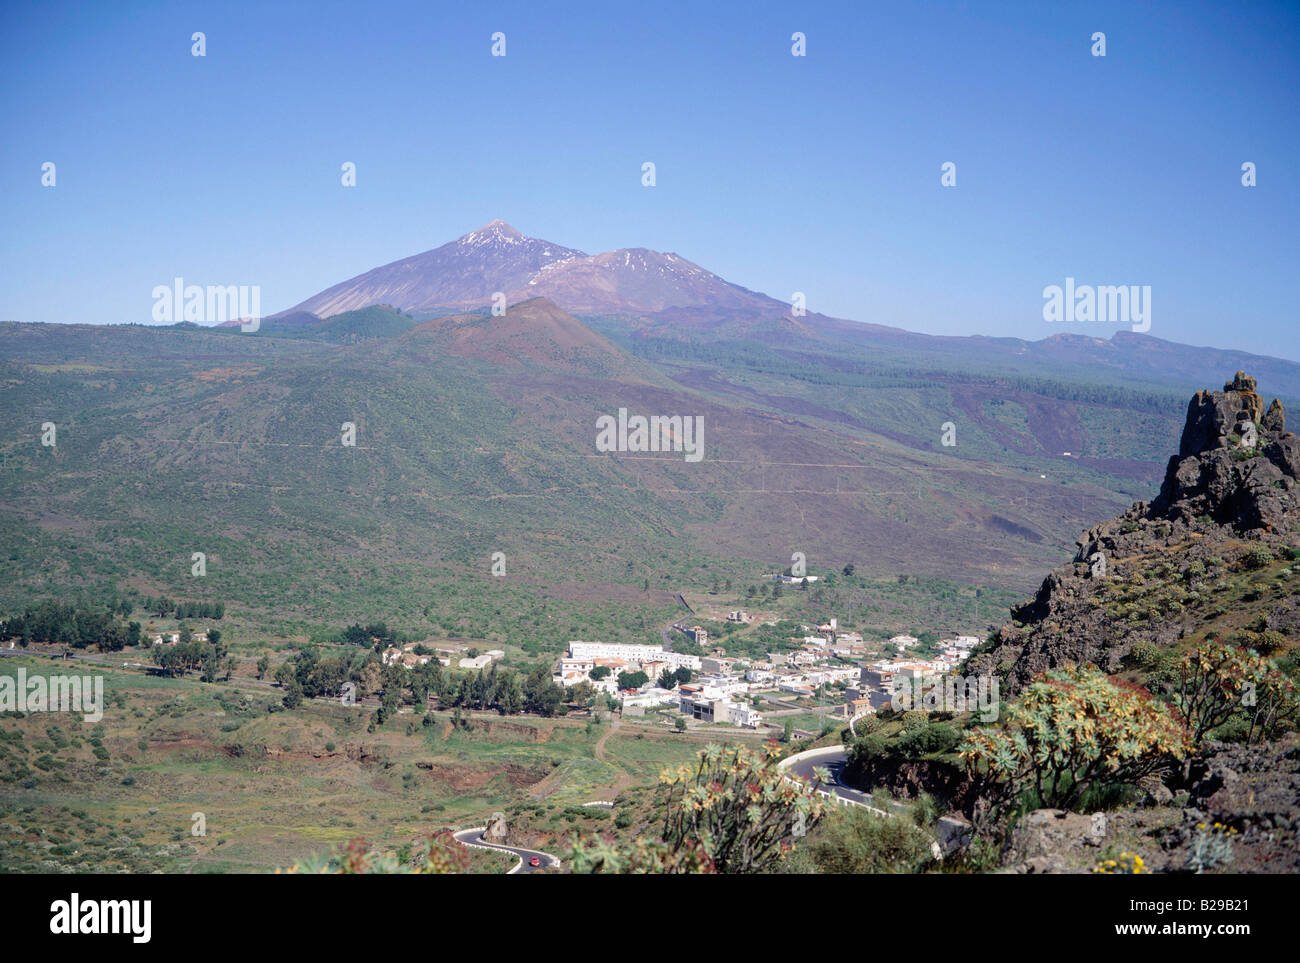 Teneriffa Santiago del Teide Mt Teide D Stockbild